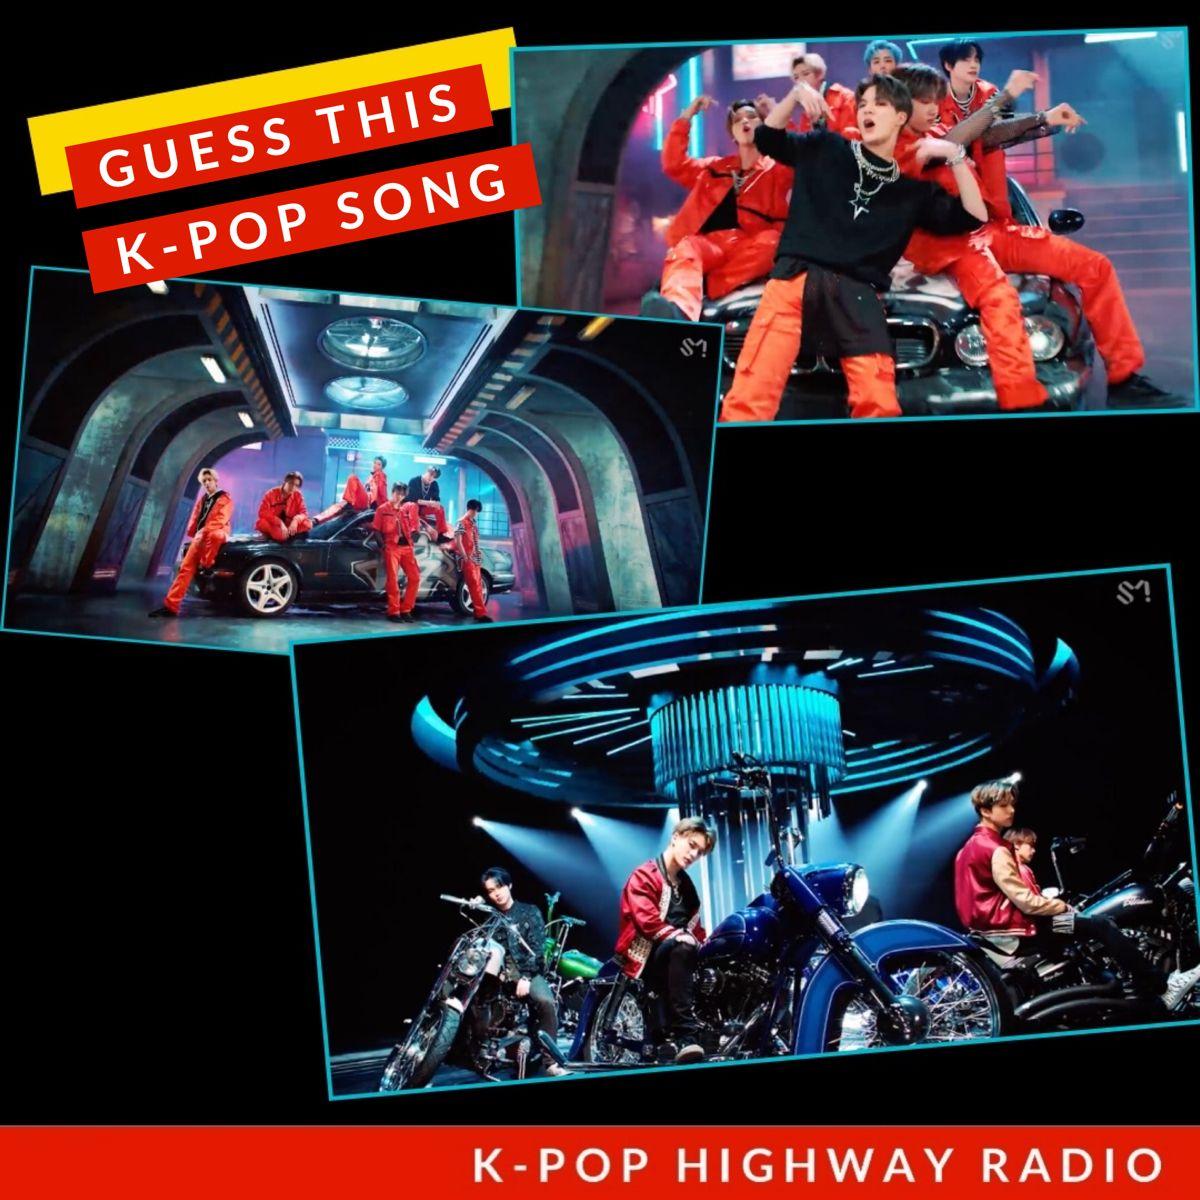 Guess This Kpop Song Kpop Radio Radio Kpop